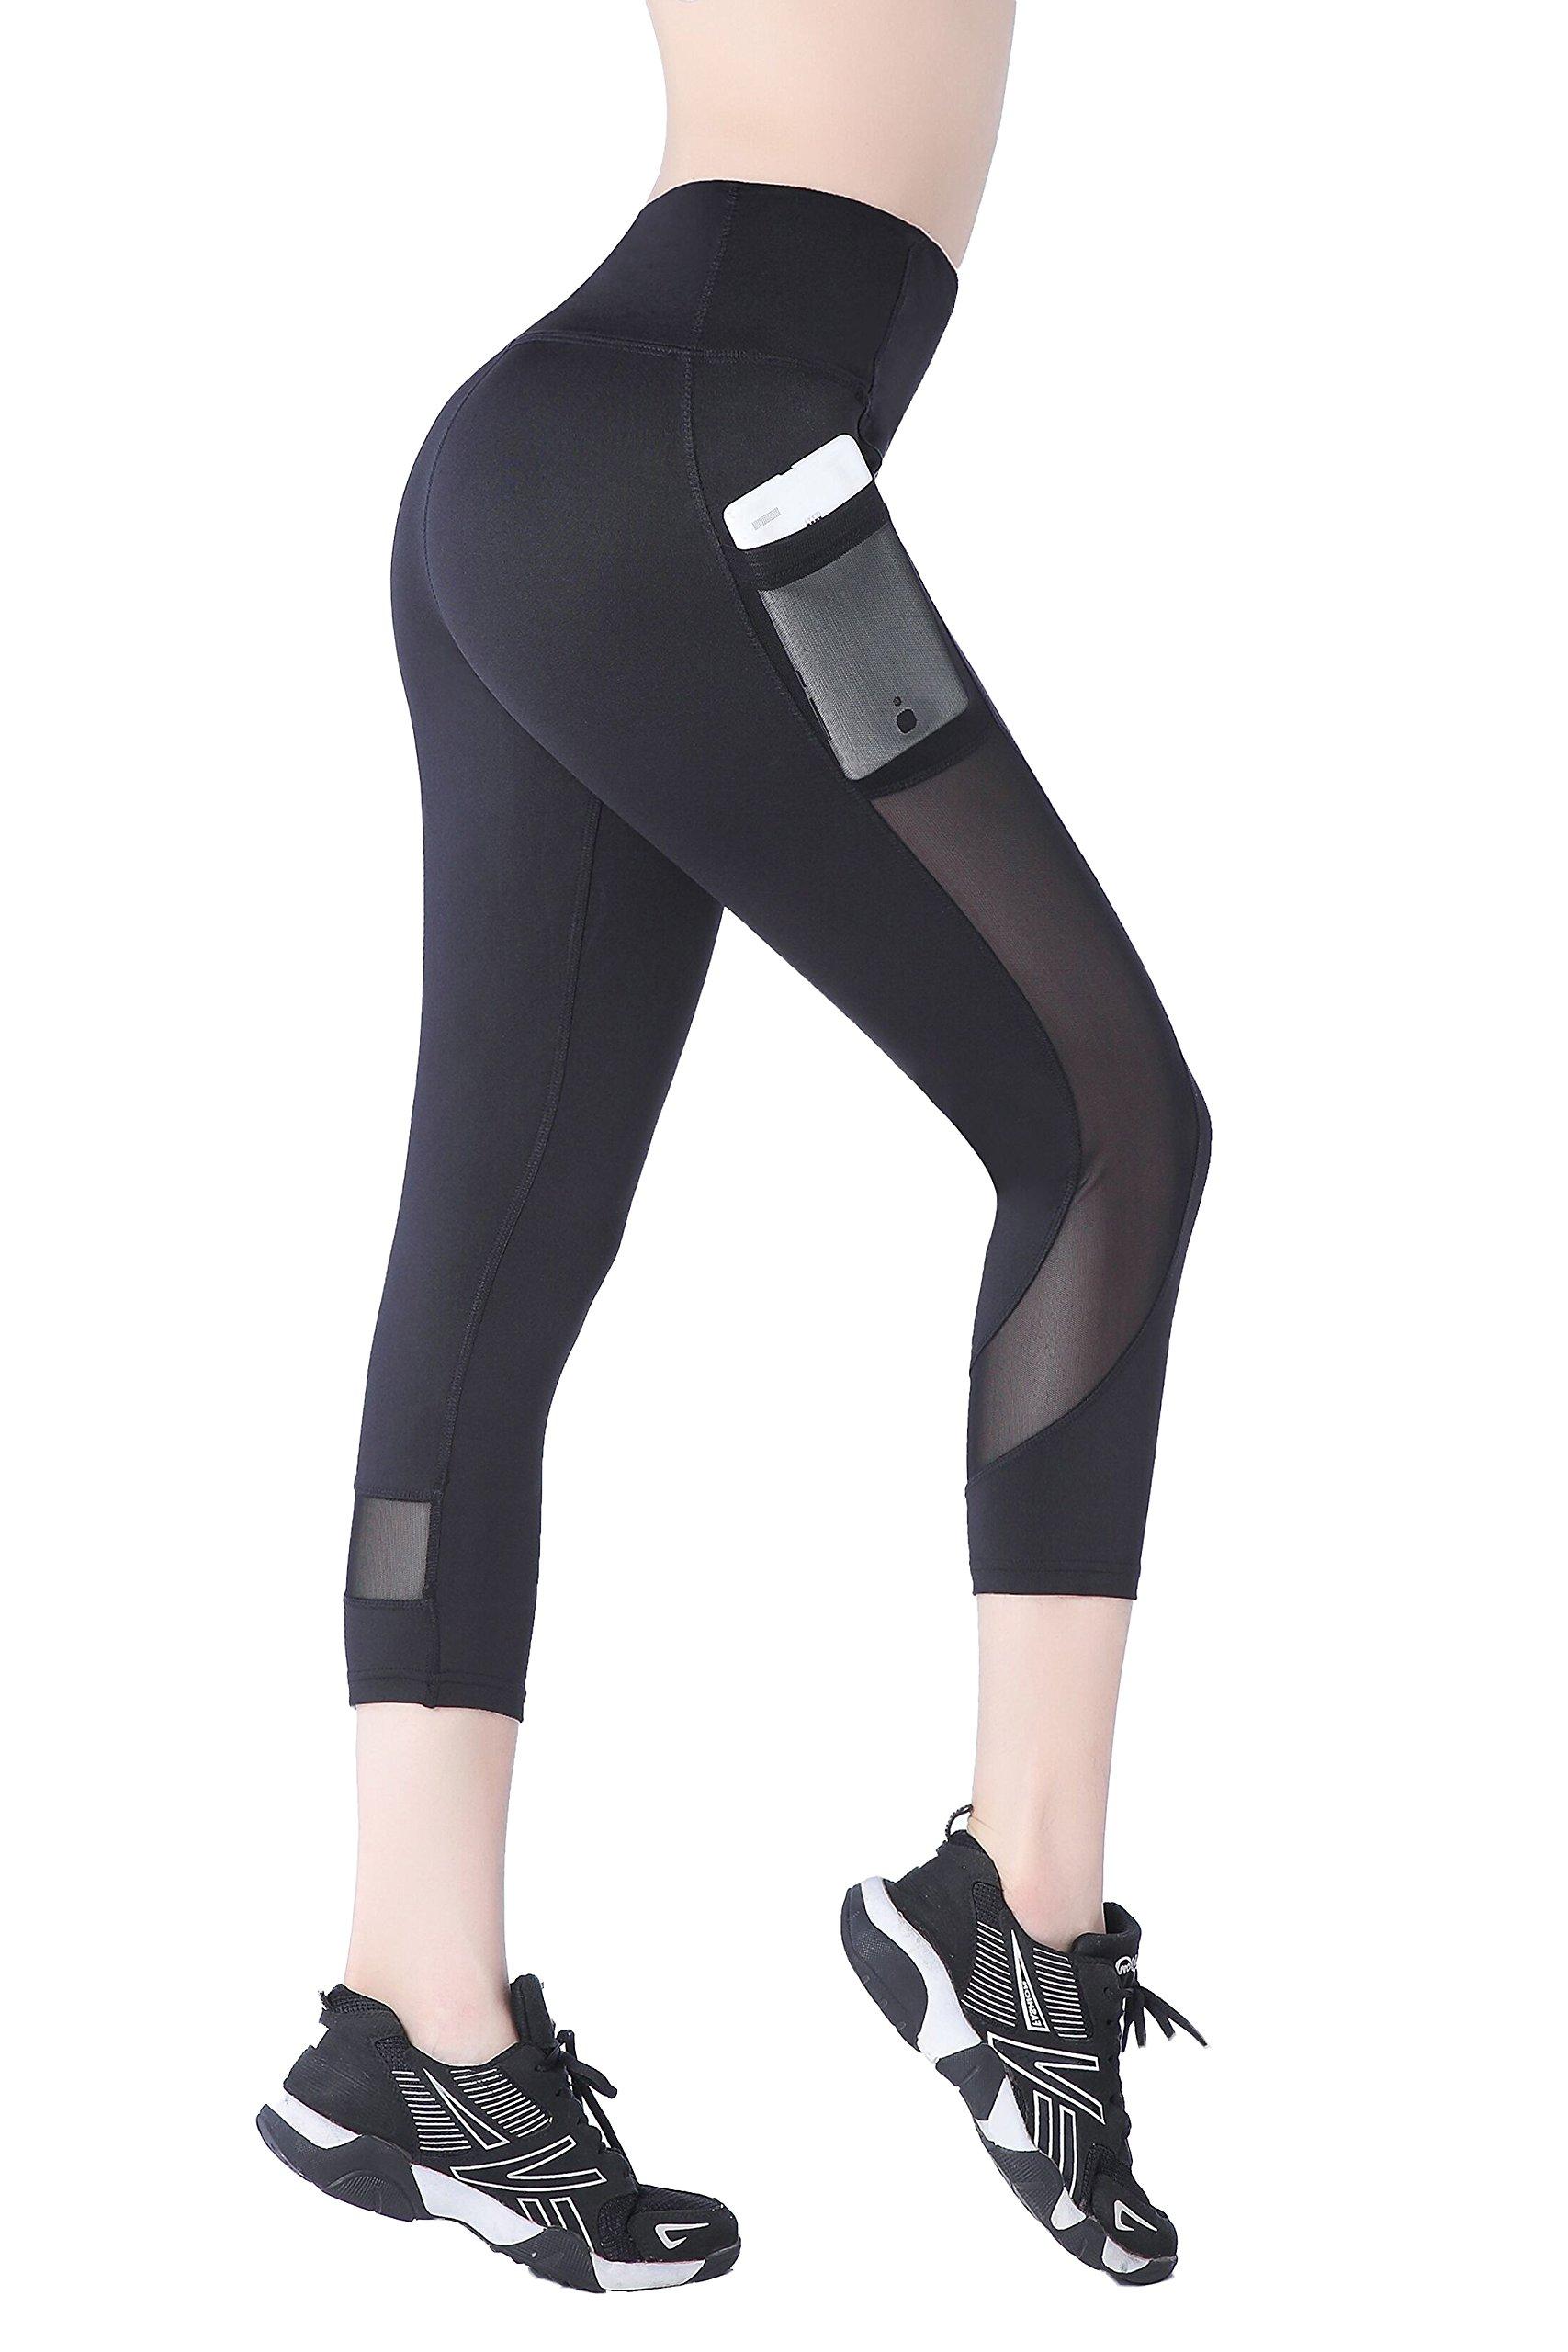 adfa1a7af957e EAST HONG Womens Mesh Capri Workout Yoga Pants Running Tights Active  Leggings product image